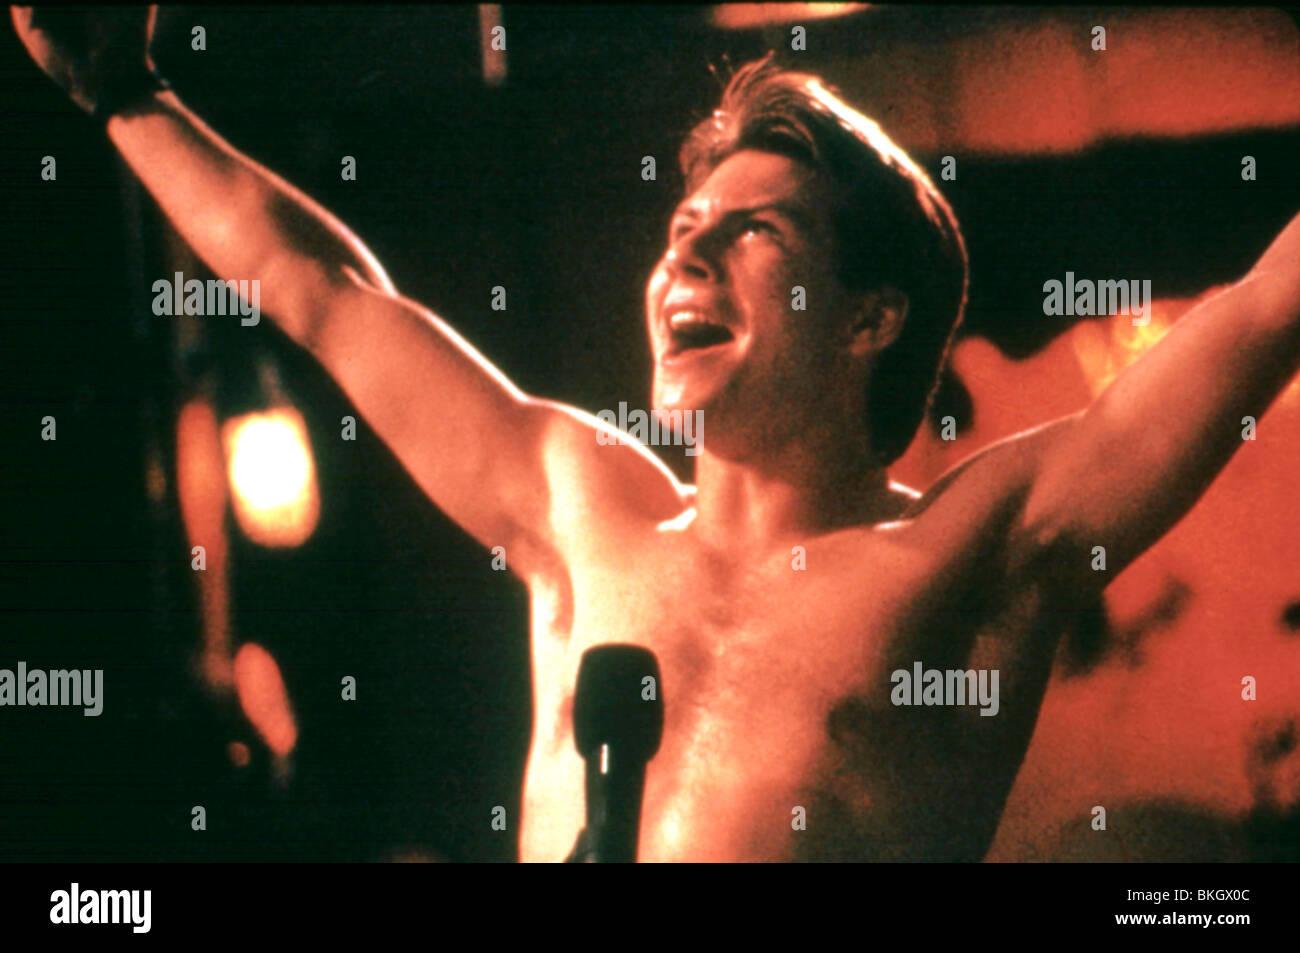 PUMP UP THE VOLUME (1990) CHRISTIAN SLATER PMV 032 - Stock Image